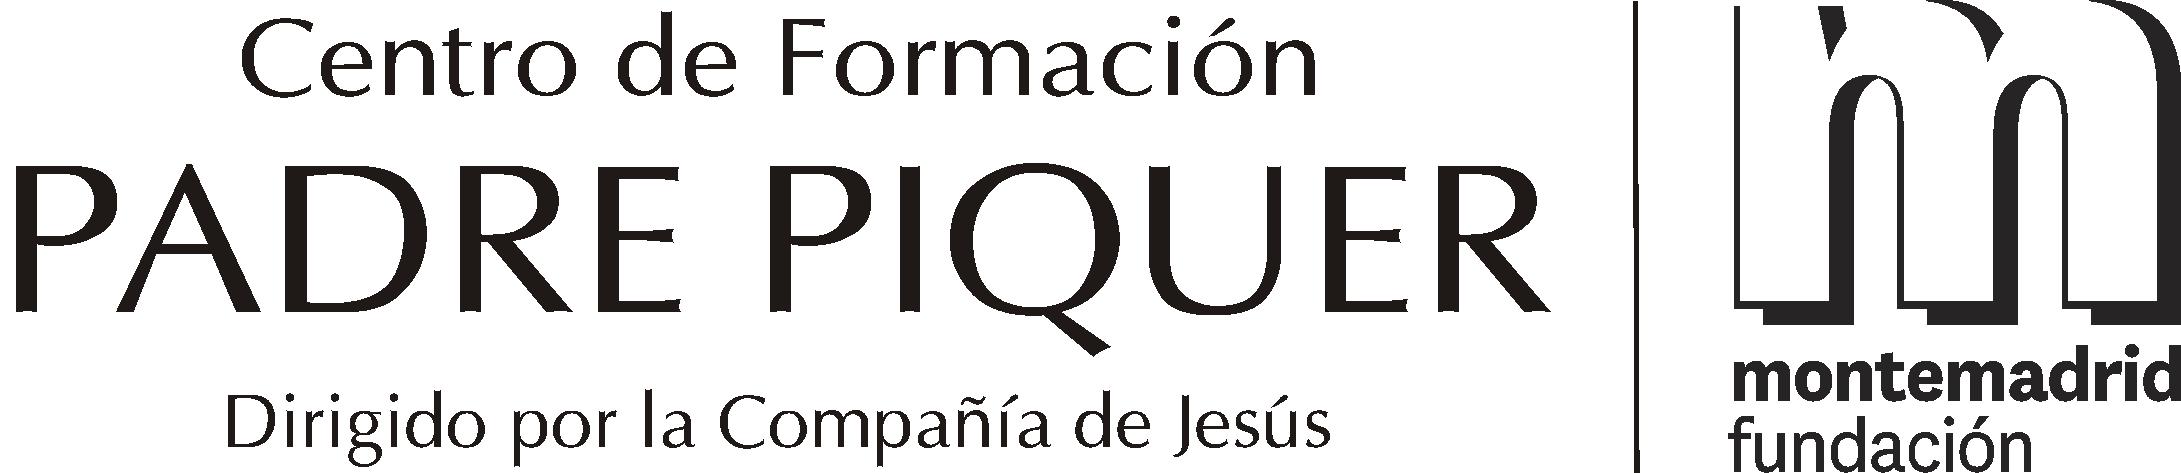 Padre Piquer